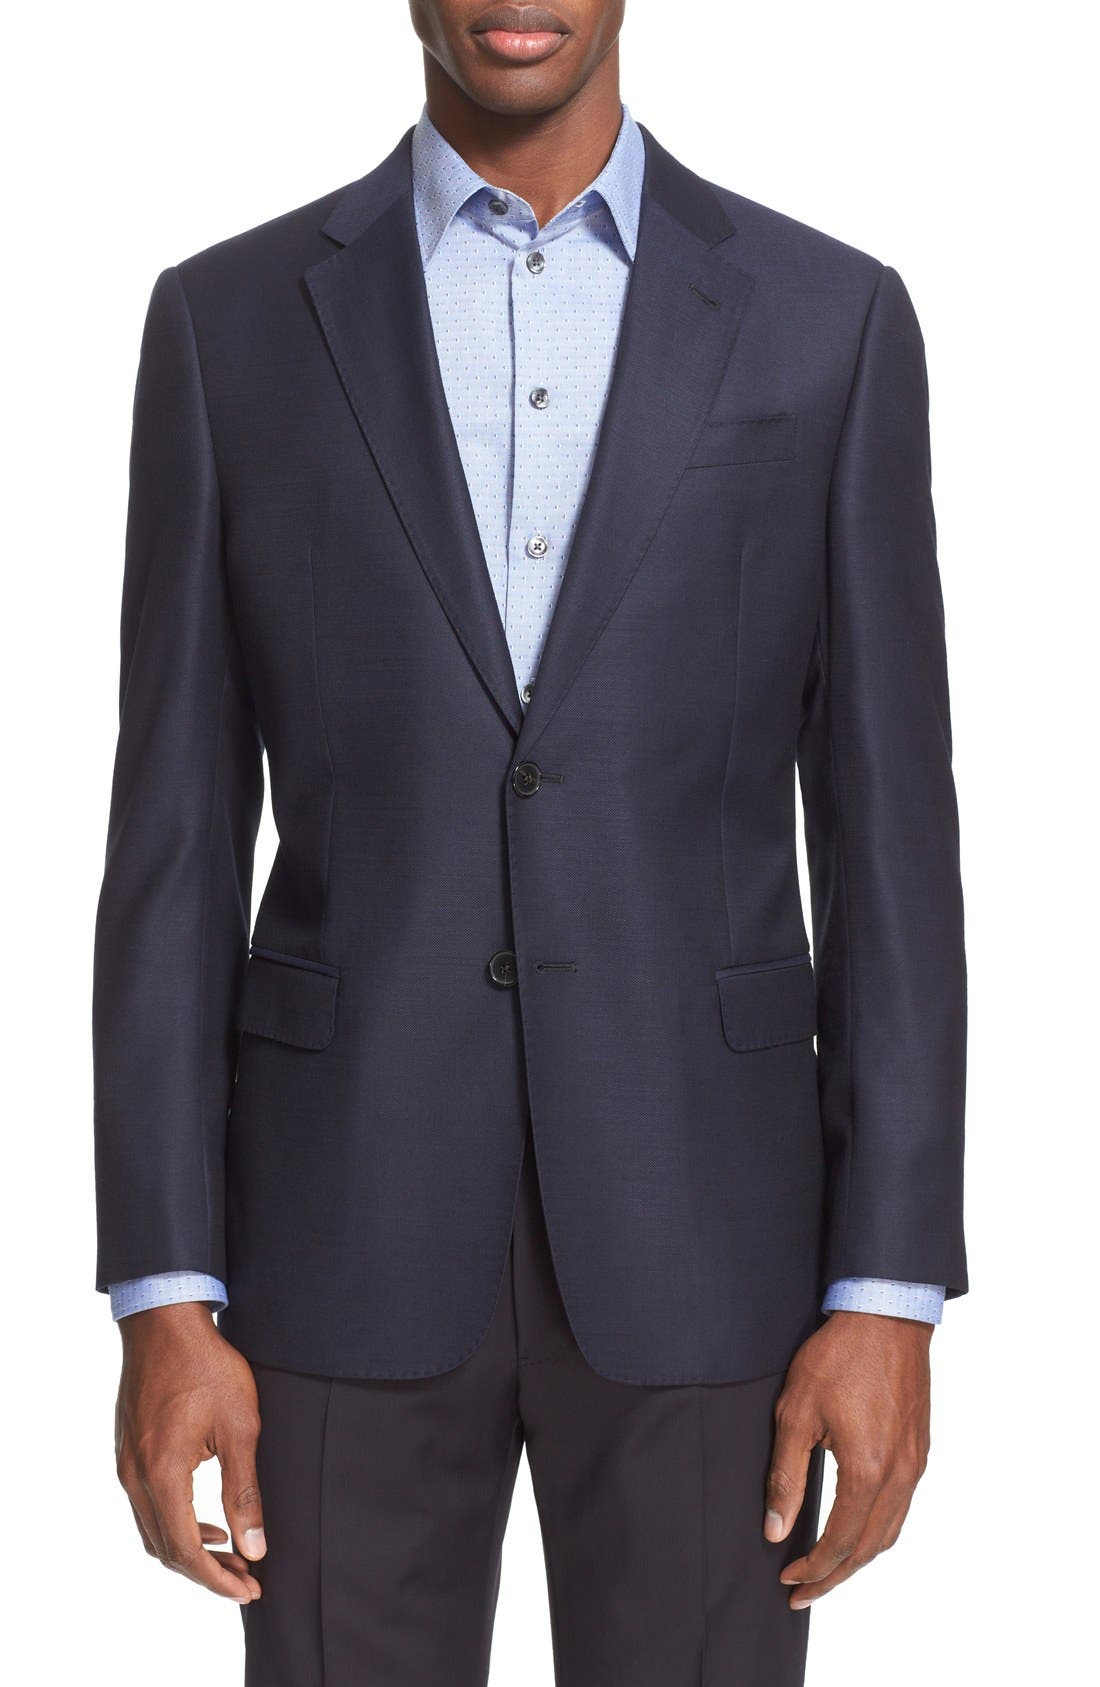 G-Line Trim Fit Wool Blazer,                             Main thumbnail 1, color,                             Navy